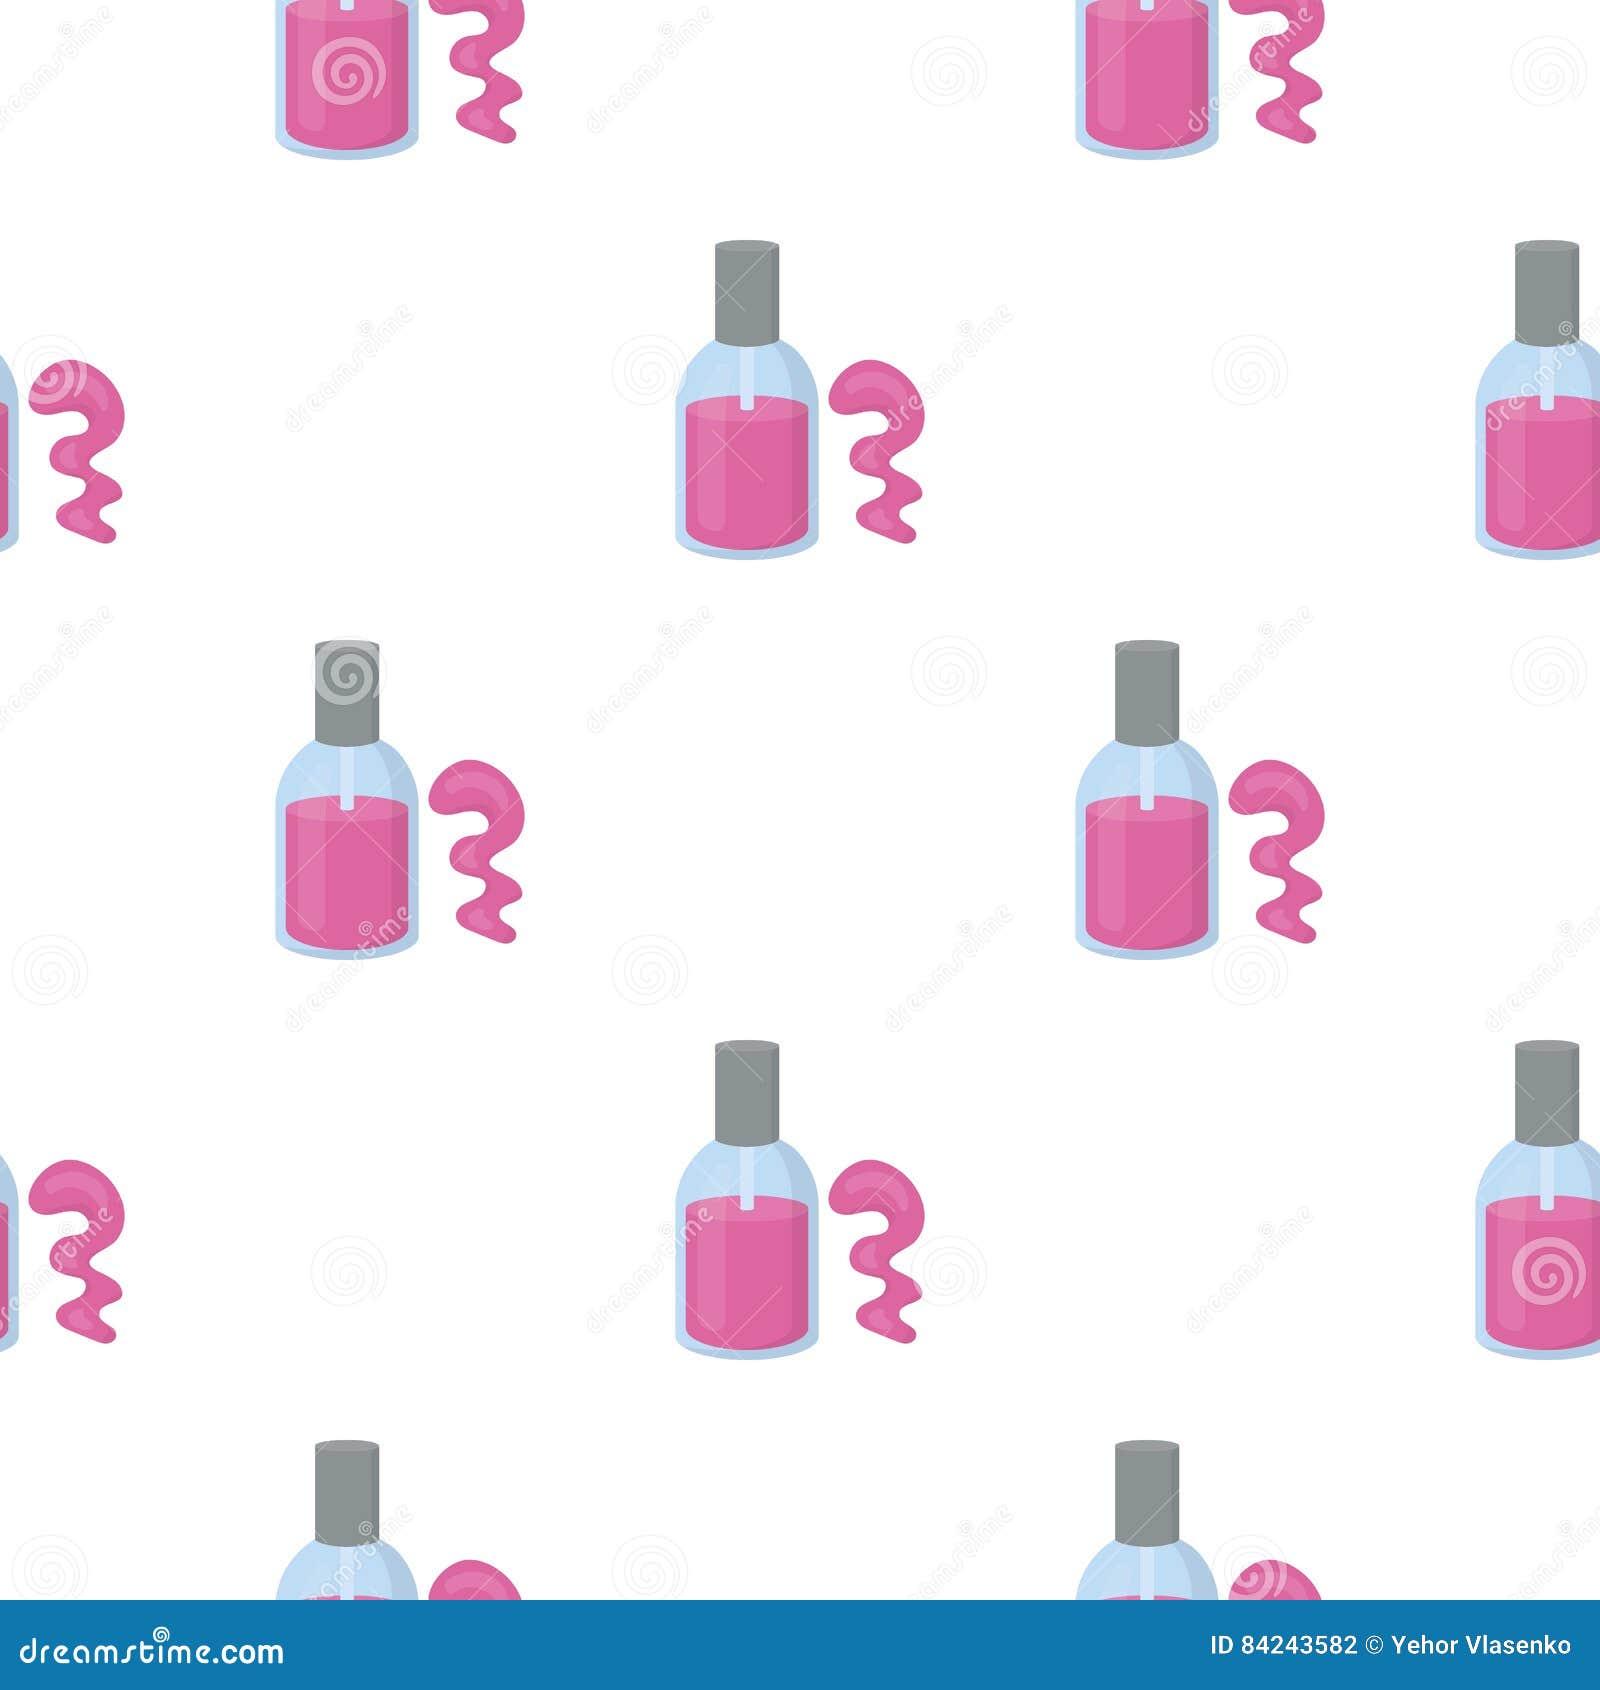 how to draw nail polish